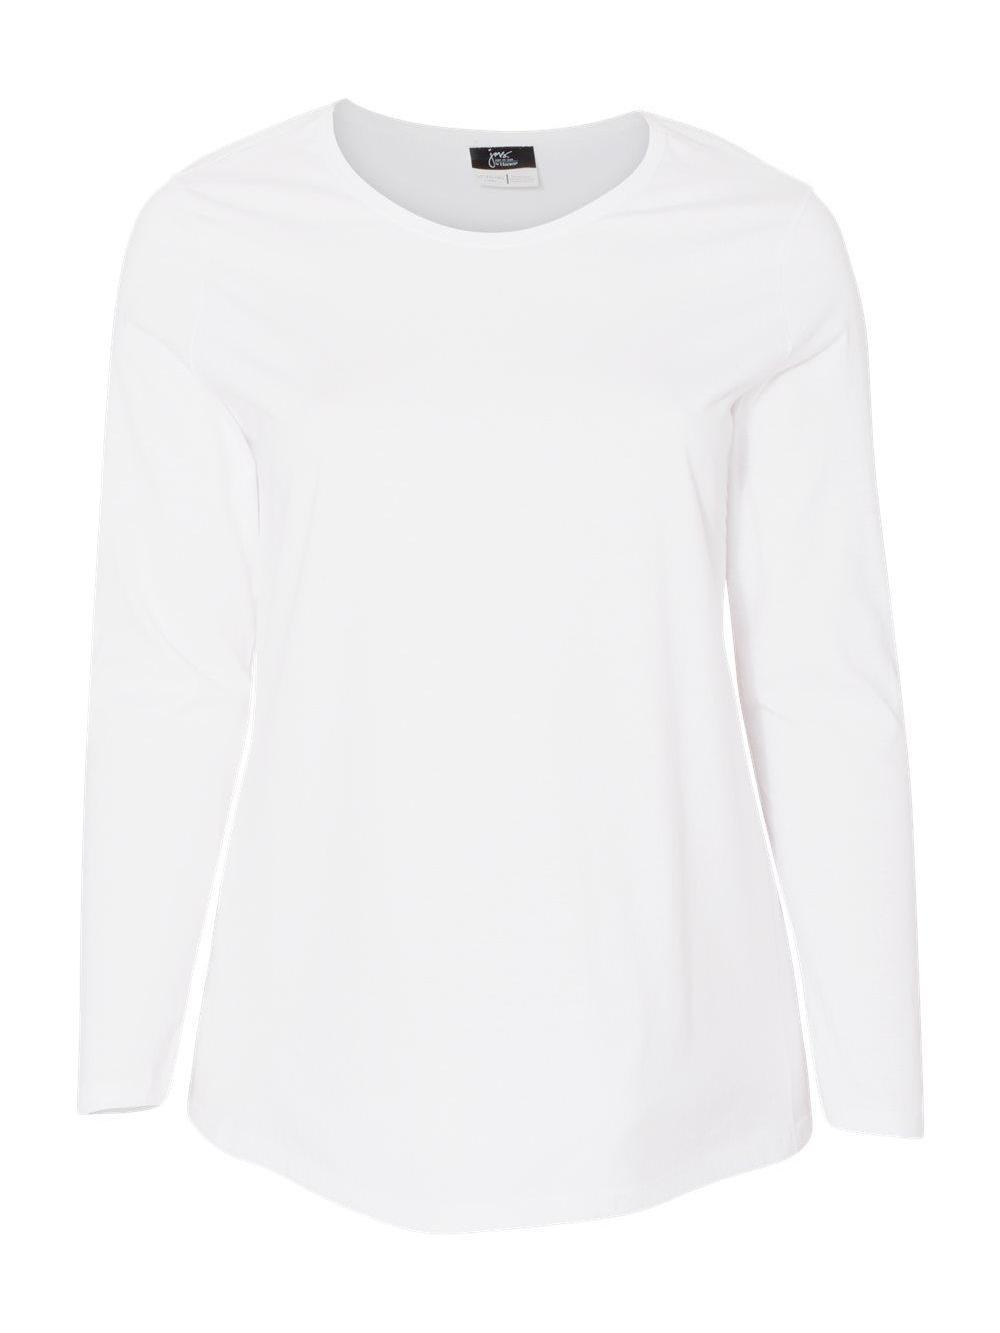 Just-My-Size-Women-039-s-Long-Sleeve-T-Shirt-JMS40 thumbnail 18